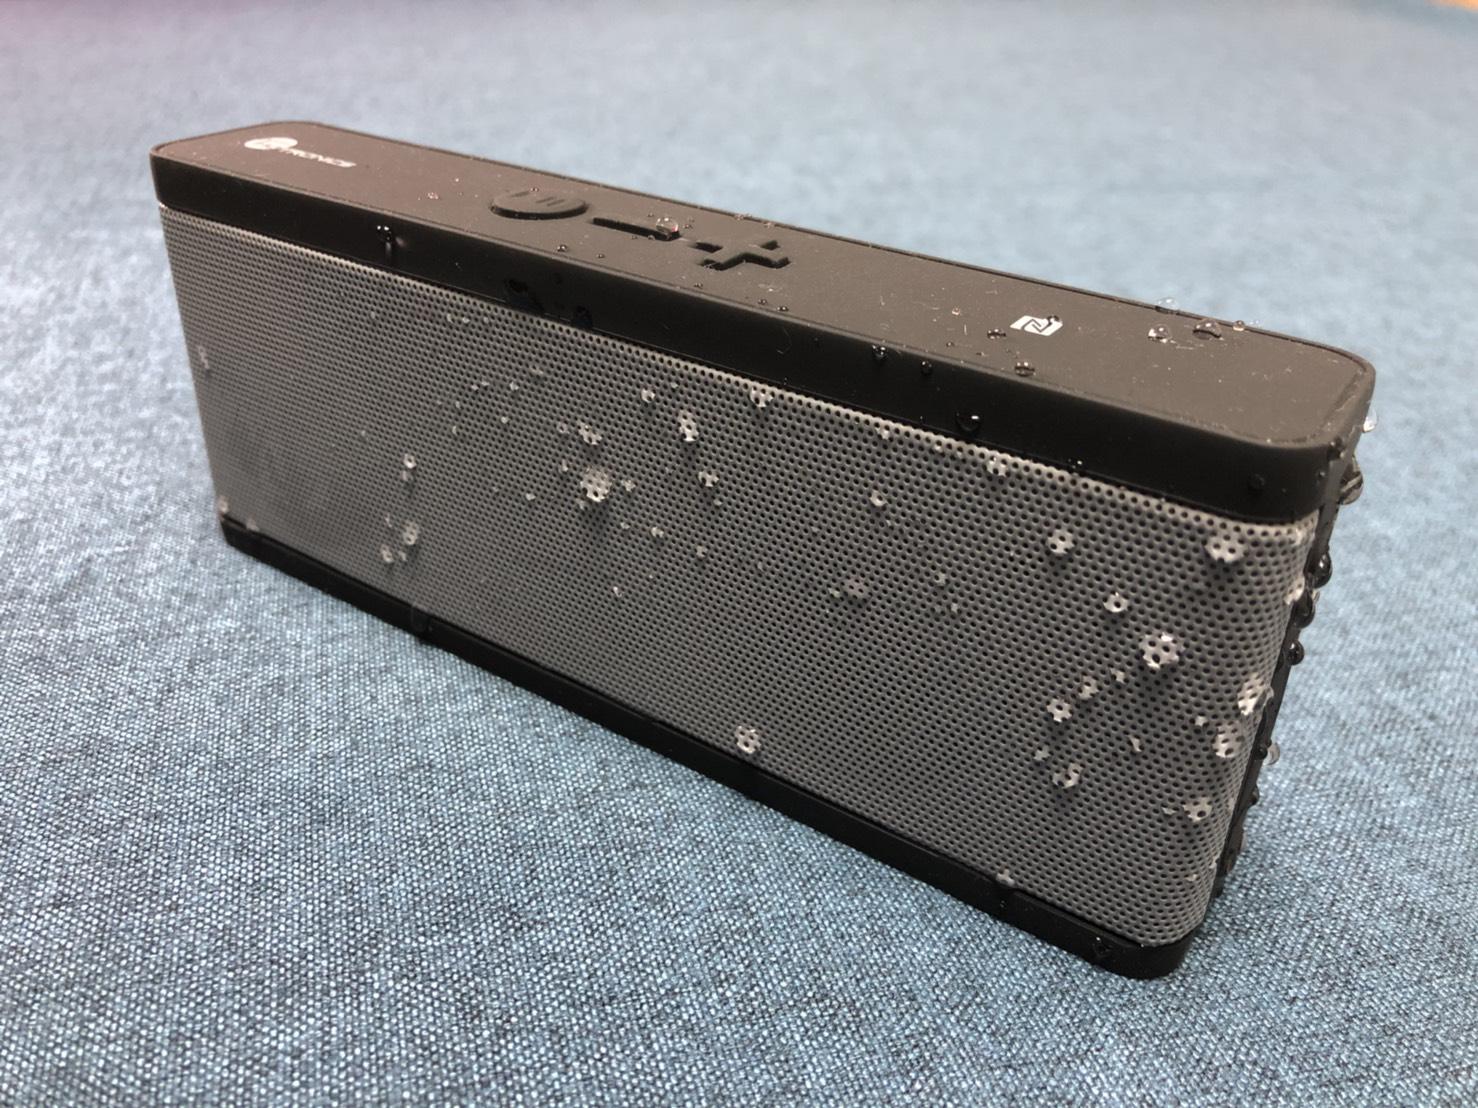 TaoTronics TT-SK09防水藍芽喇叭推薦 - 防水IPX5